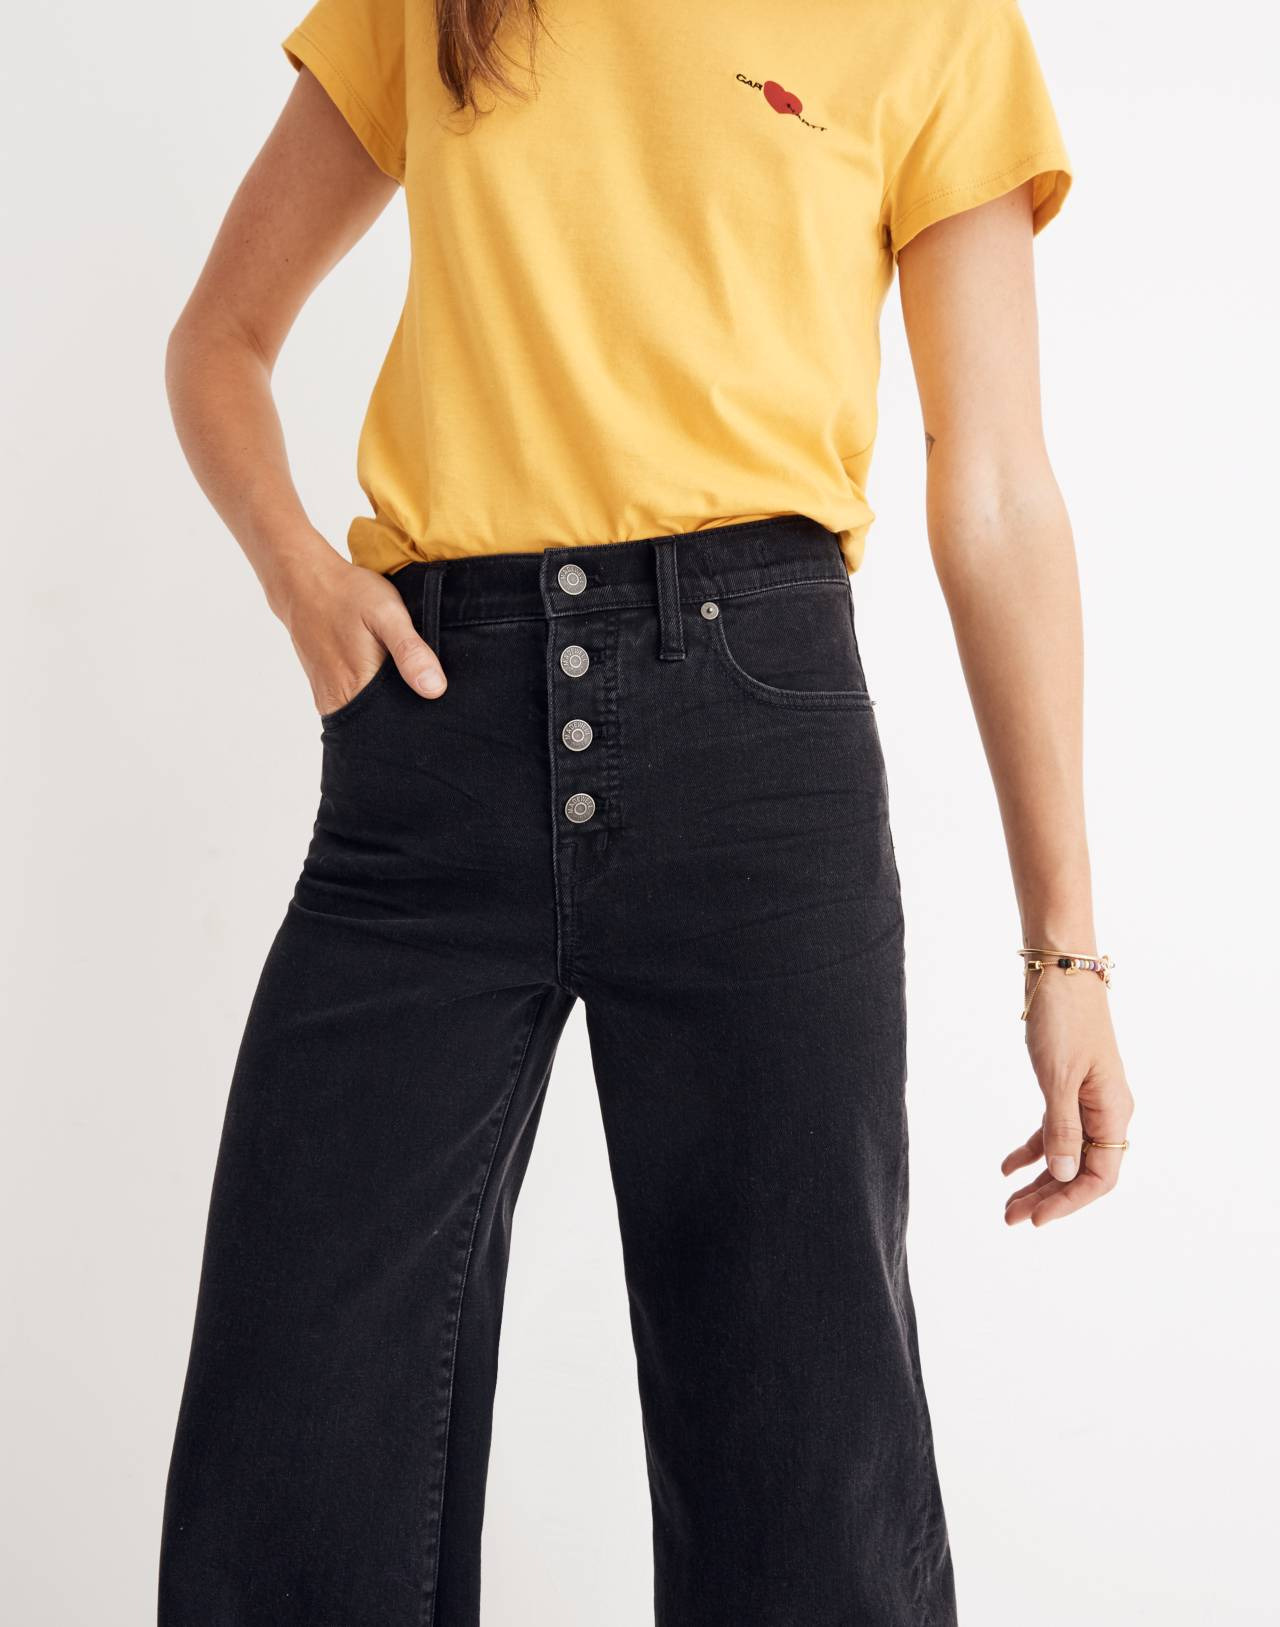 Tall Wide-Leg Crop Jeans in Lunar Wash: Button-Front Edition in lunar wash image 3